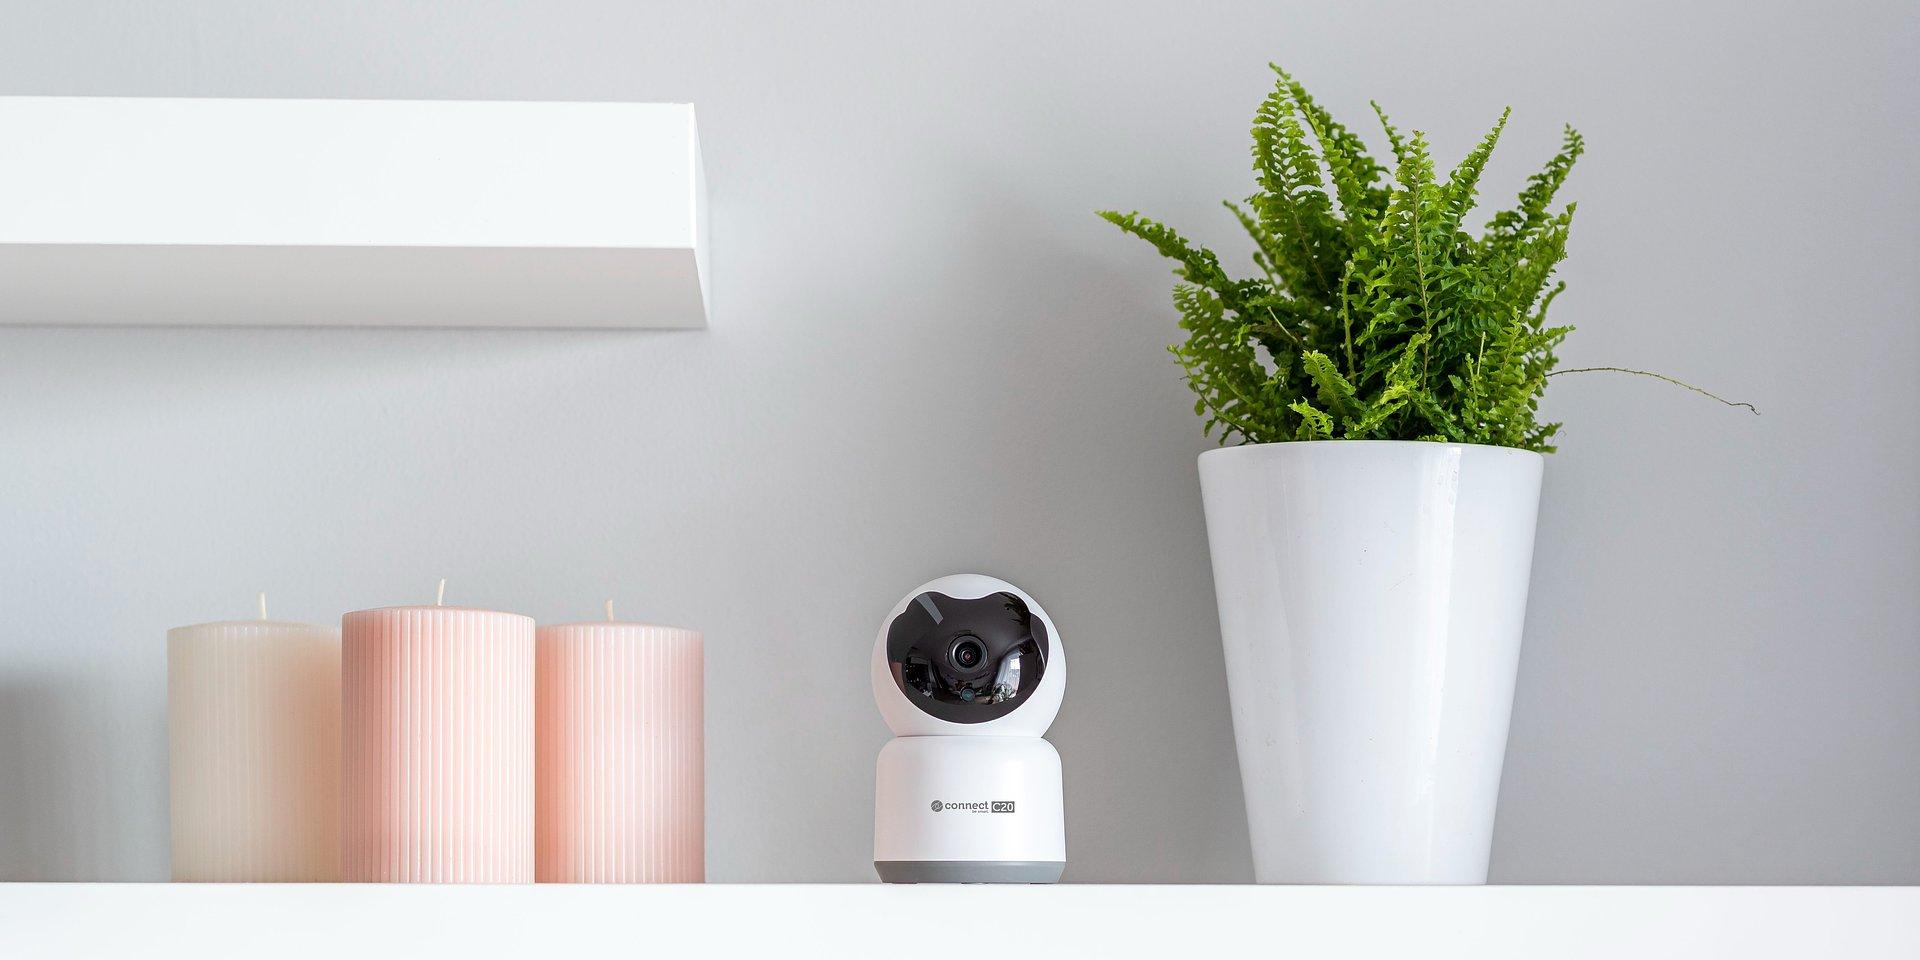 Inteligentne kamery Wi-Fi z serii Kruger&Matz Connect